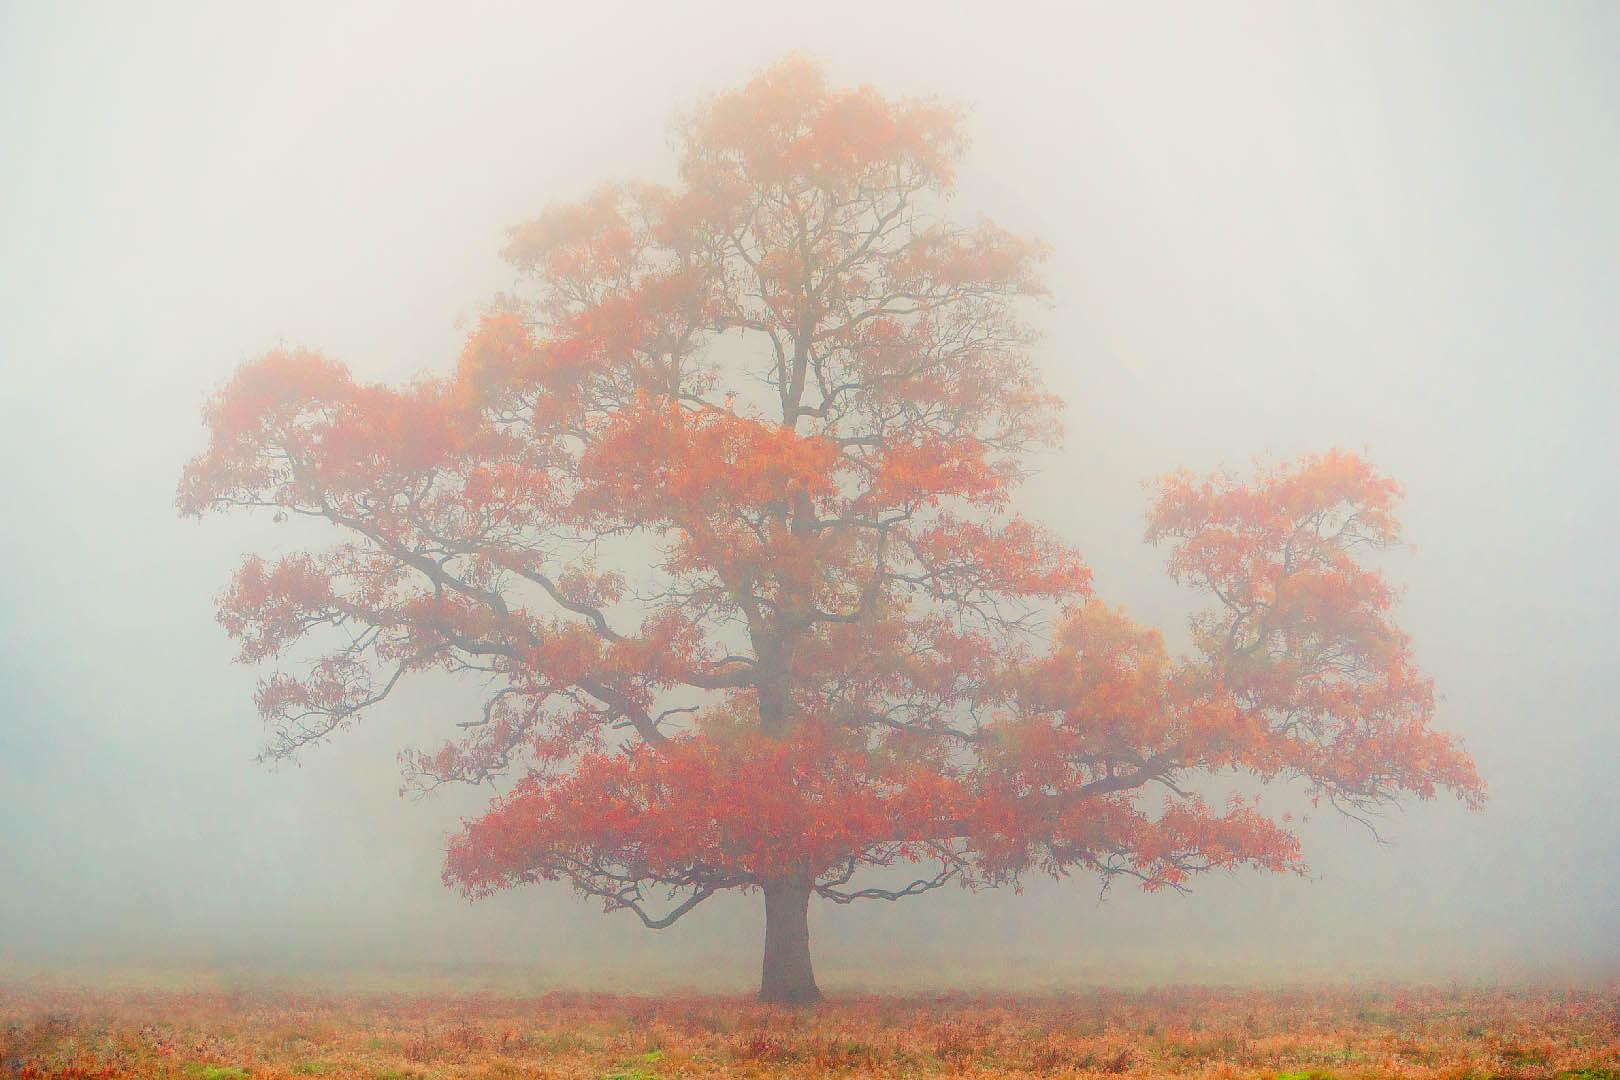 Tree In Fog #2